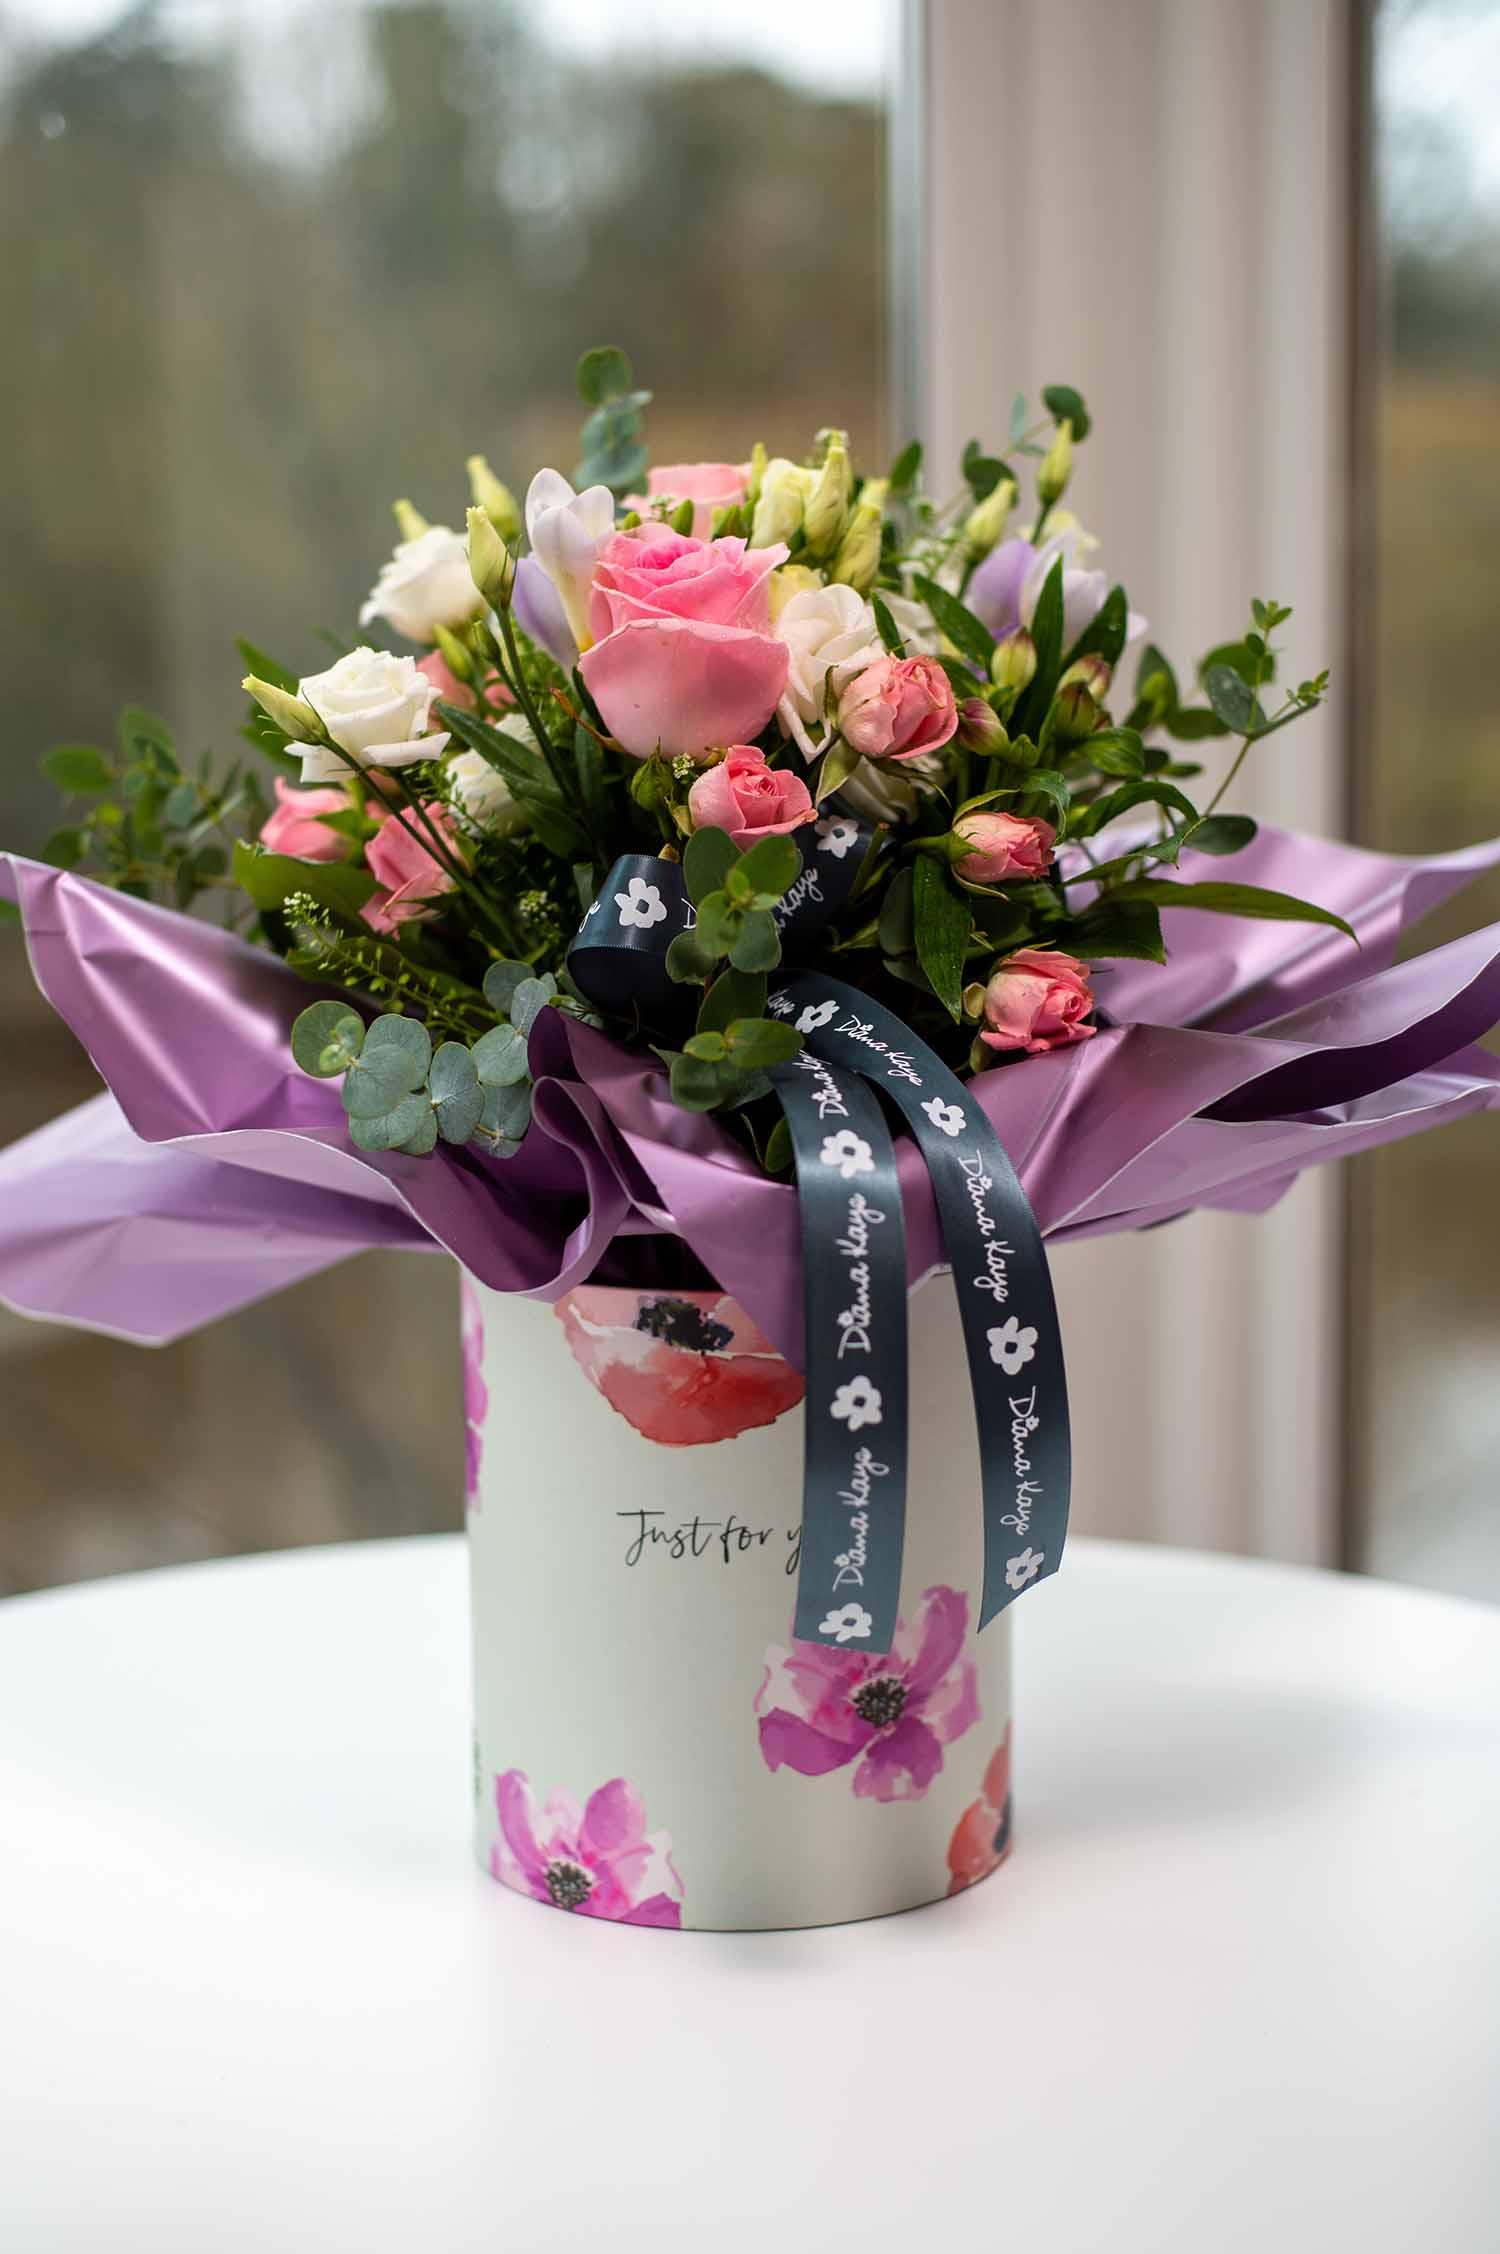 just for you  diana kaye florist